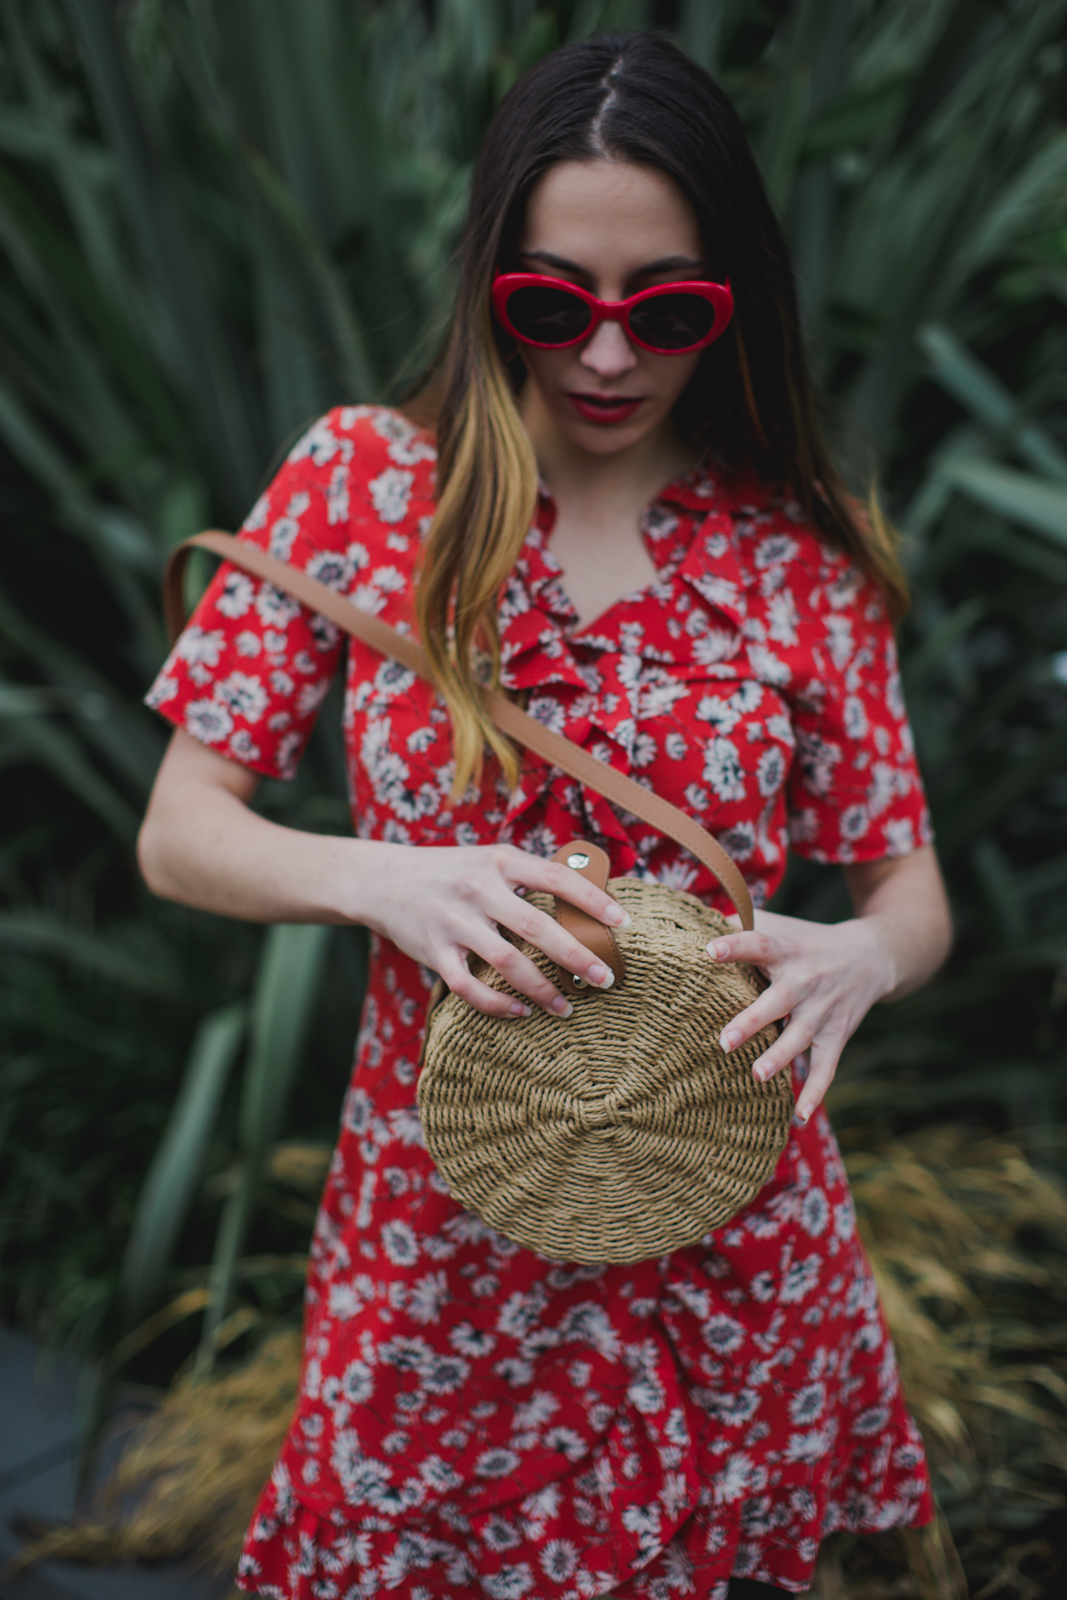 fashion-photographer-london-fashionstory-jasmina-haskovic-minas-planet-uk22.jpg